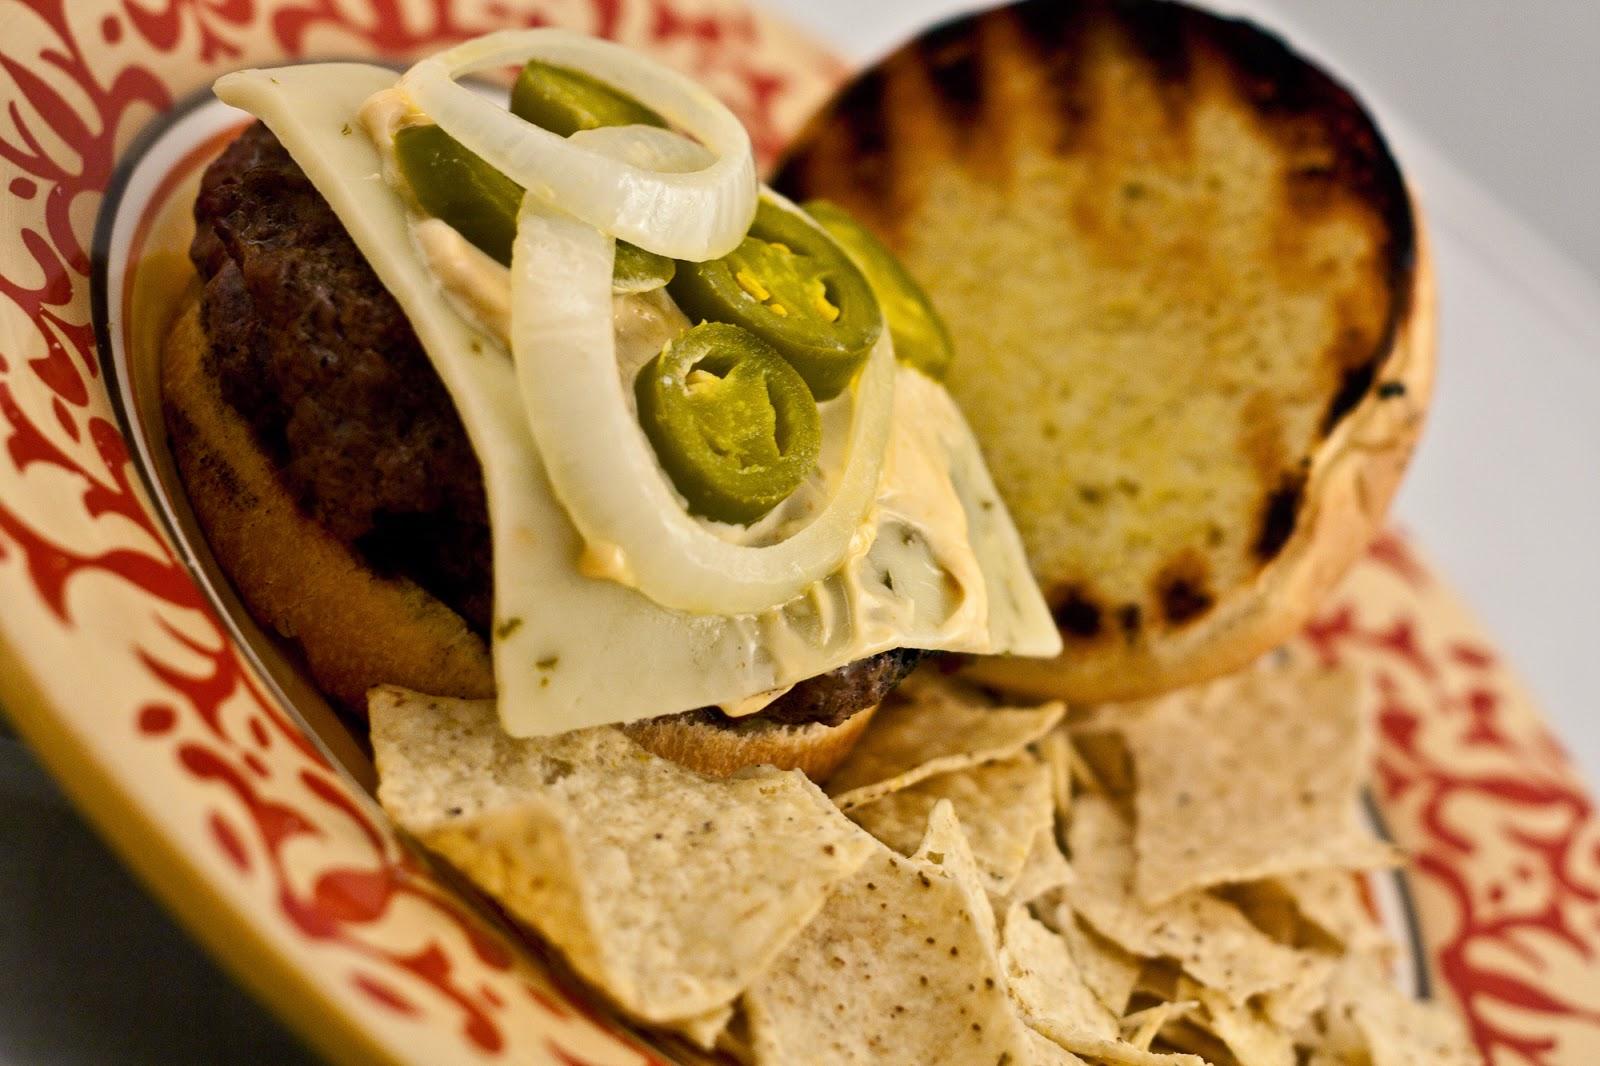 Spicy Bison Burger